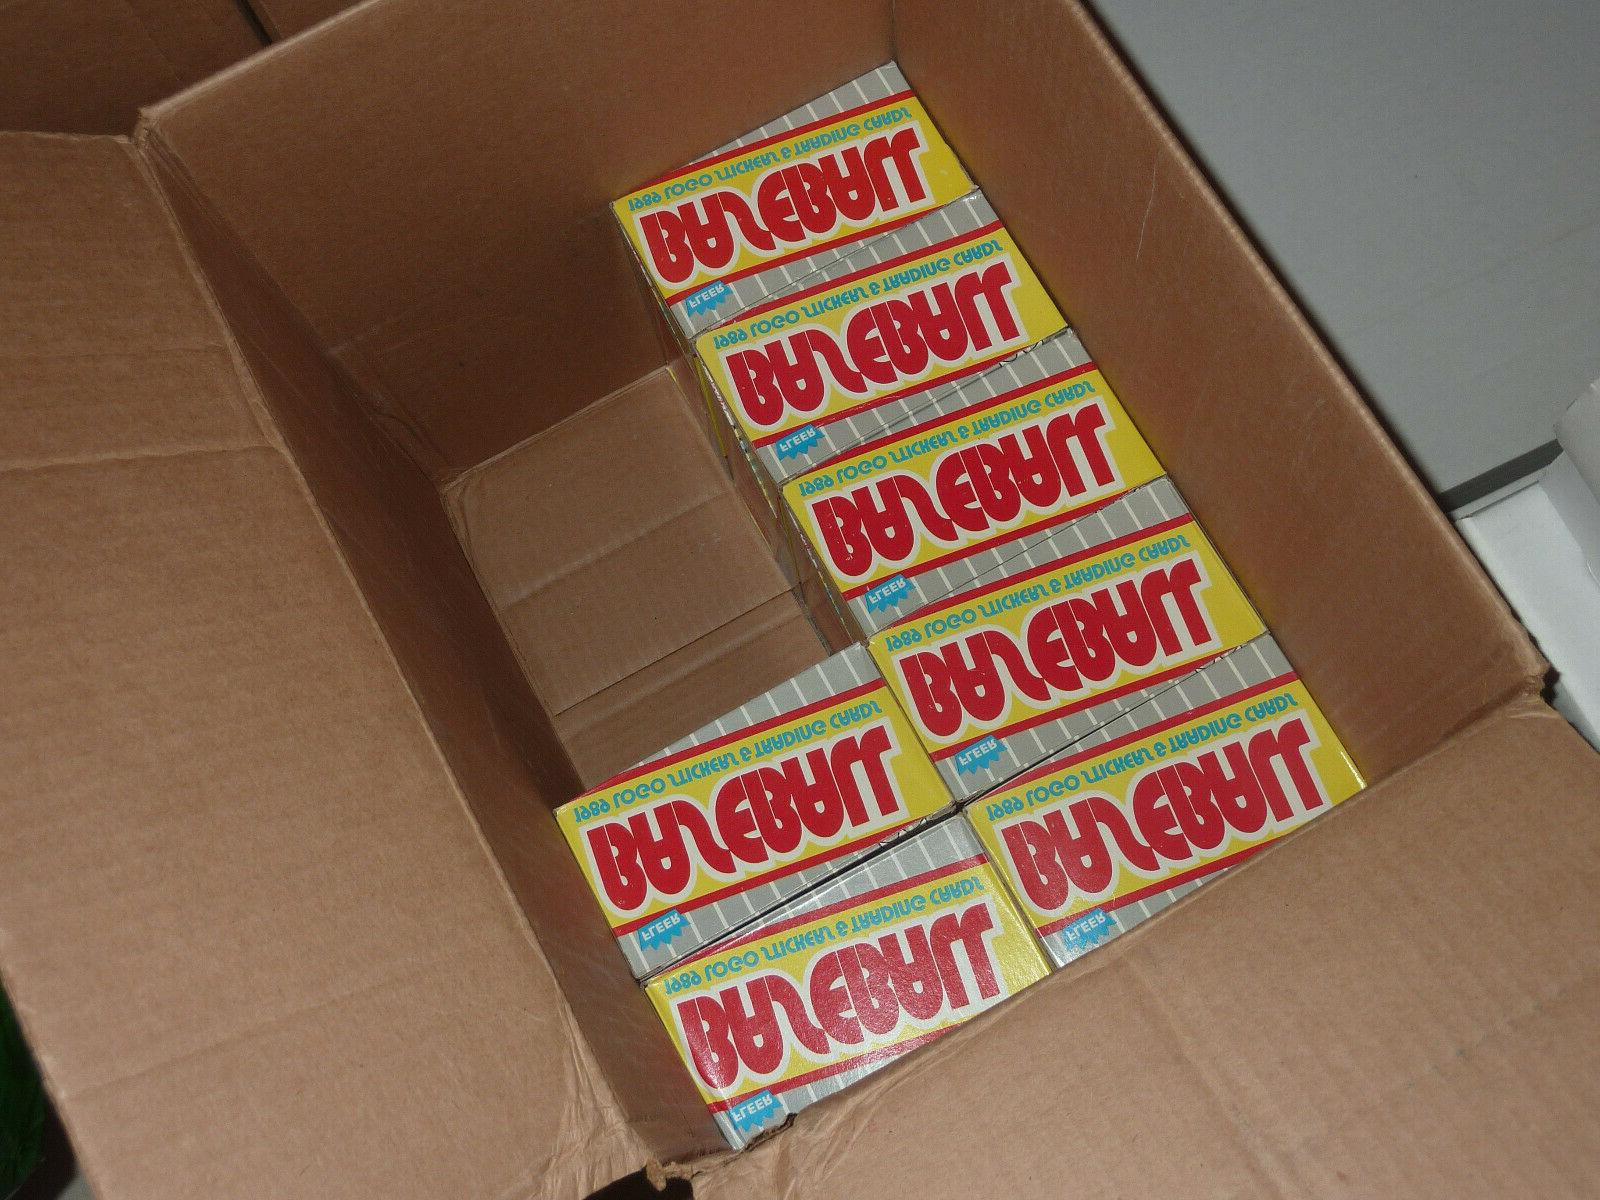 1989 BASEBALL BOXES 36 Packs/Box